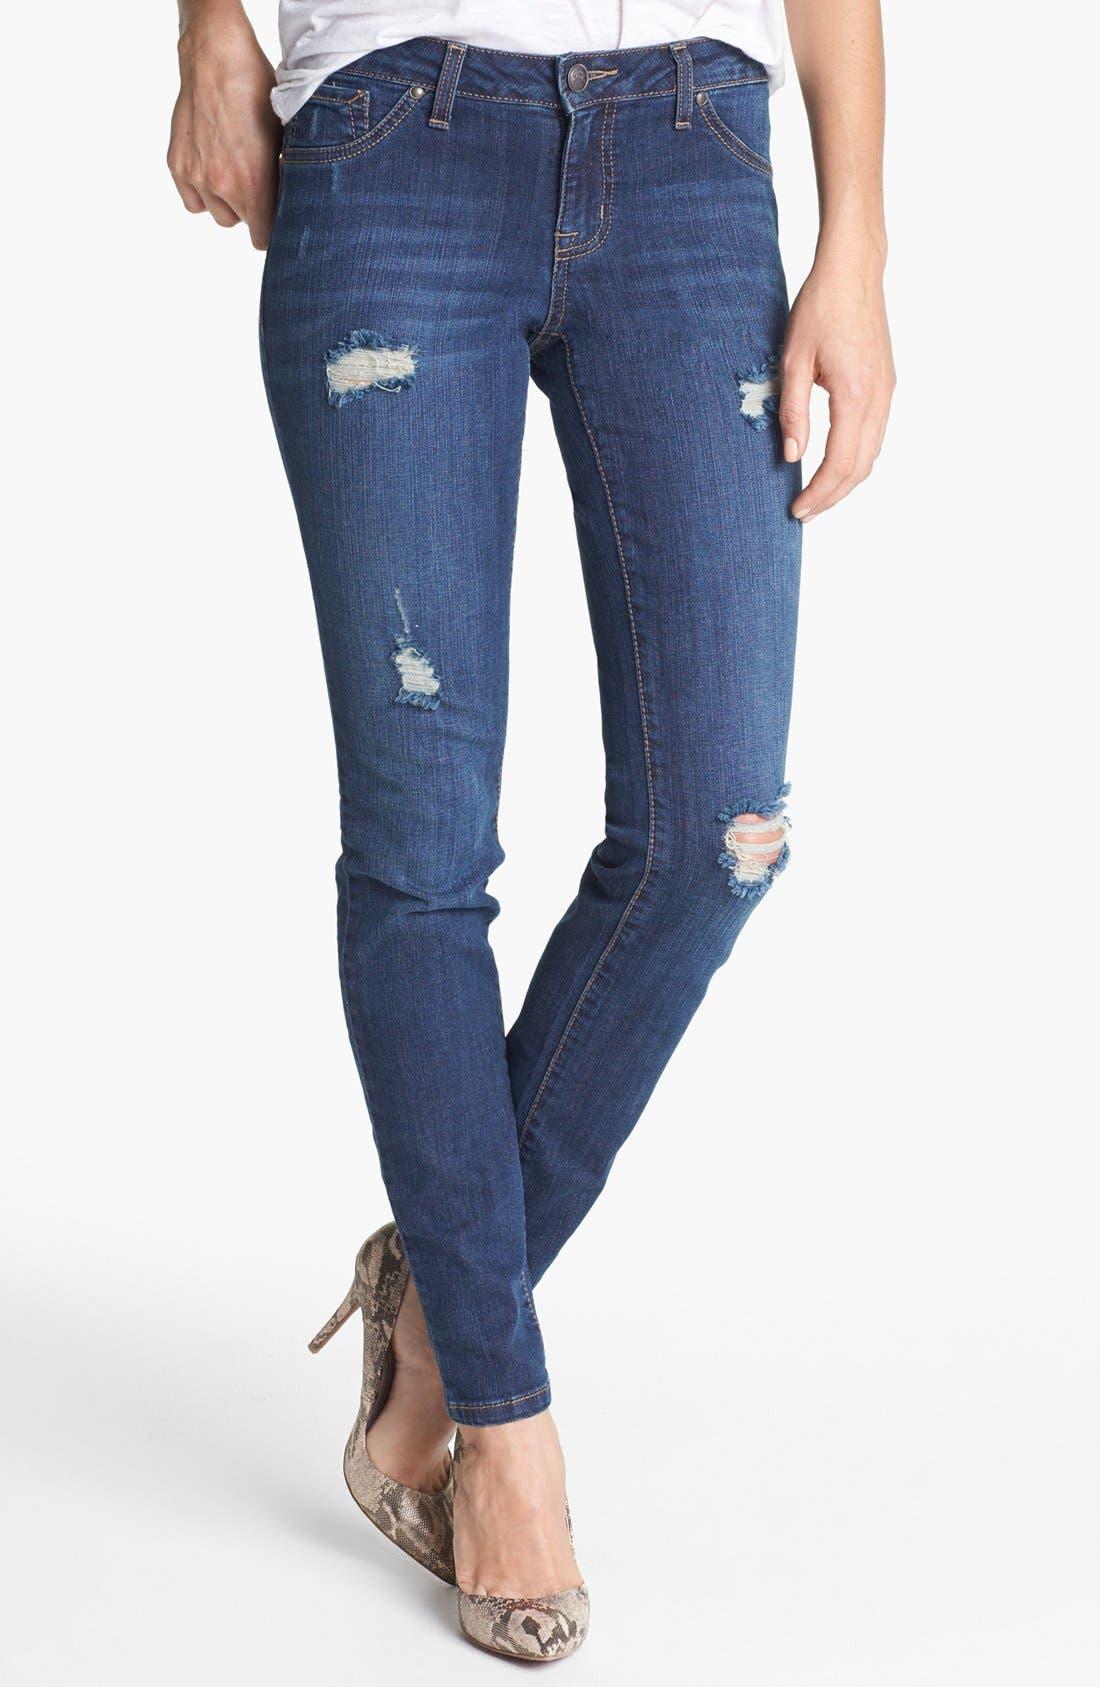 Alternate Image 1 Selected - Jessica Simpson 'Kiss Me' Deconstructed Skinny Jeans (Bing Bang)